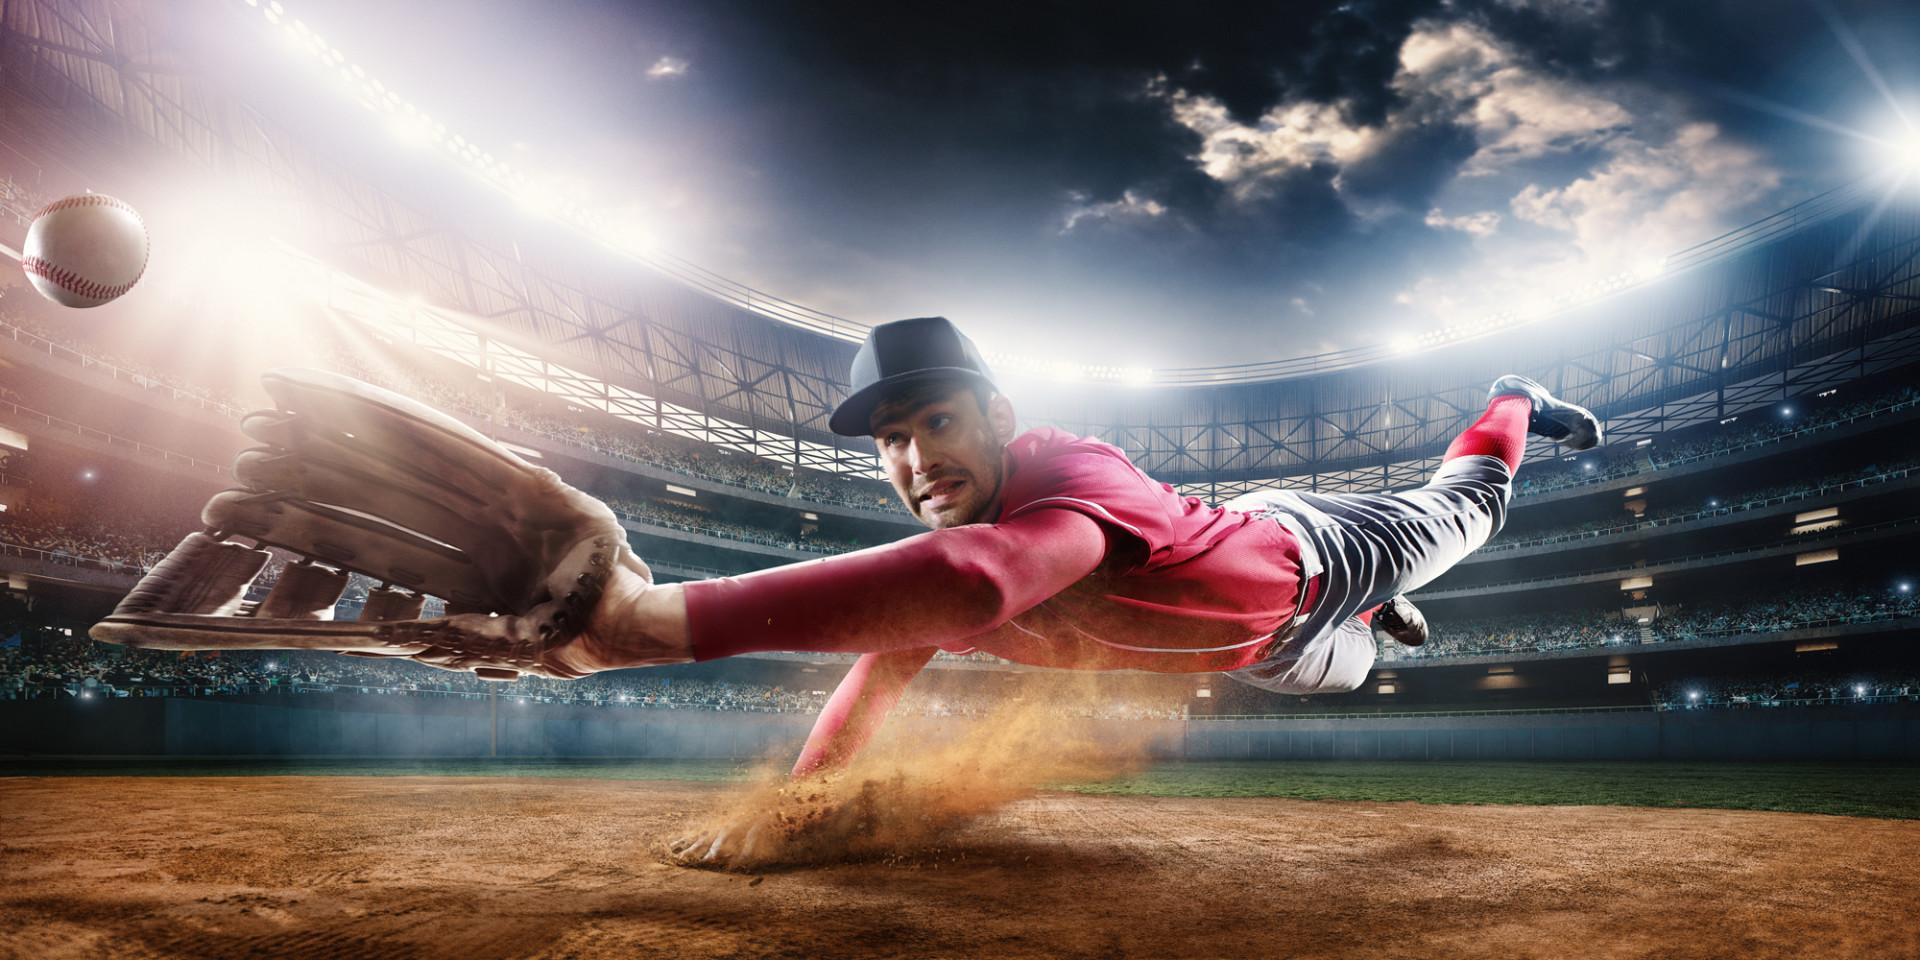 23_03_2016_baseball_game_03-1920x960